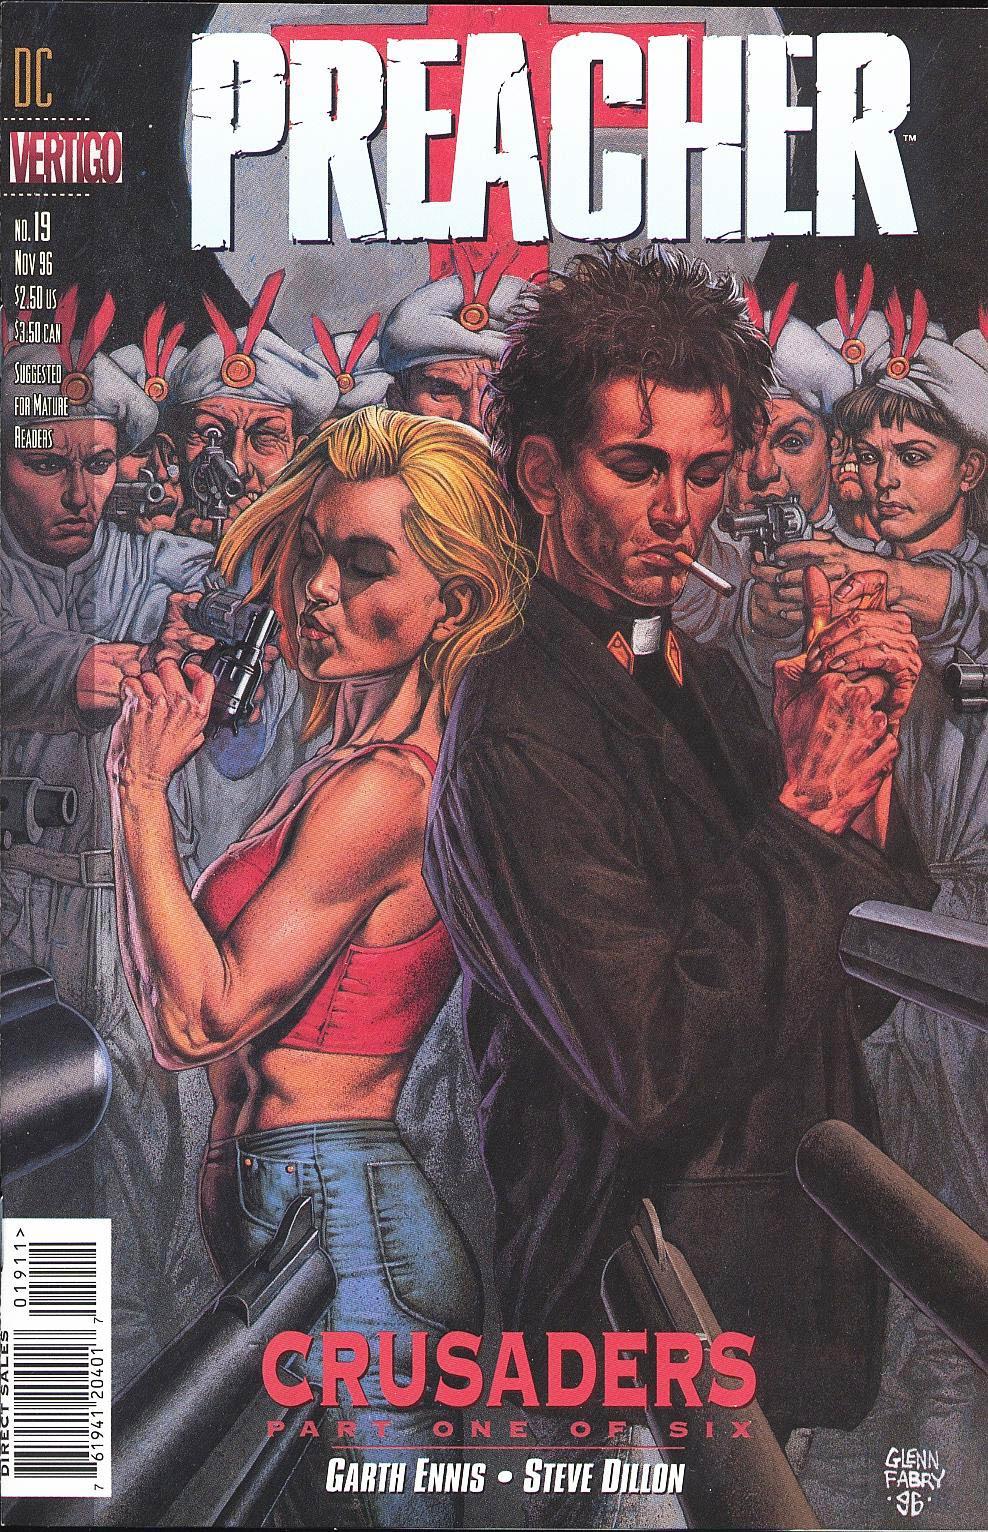 Комиксы Онлайн - Проповедник - # 19 - Страница №1 - Preacher - Preacher # 19